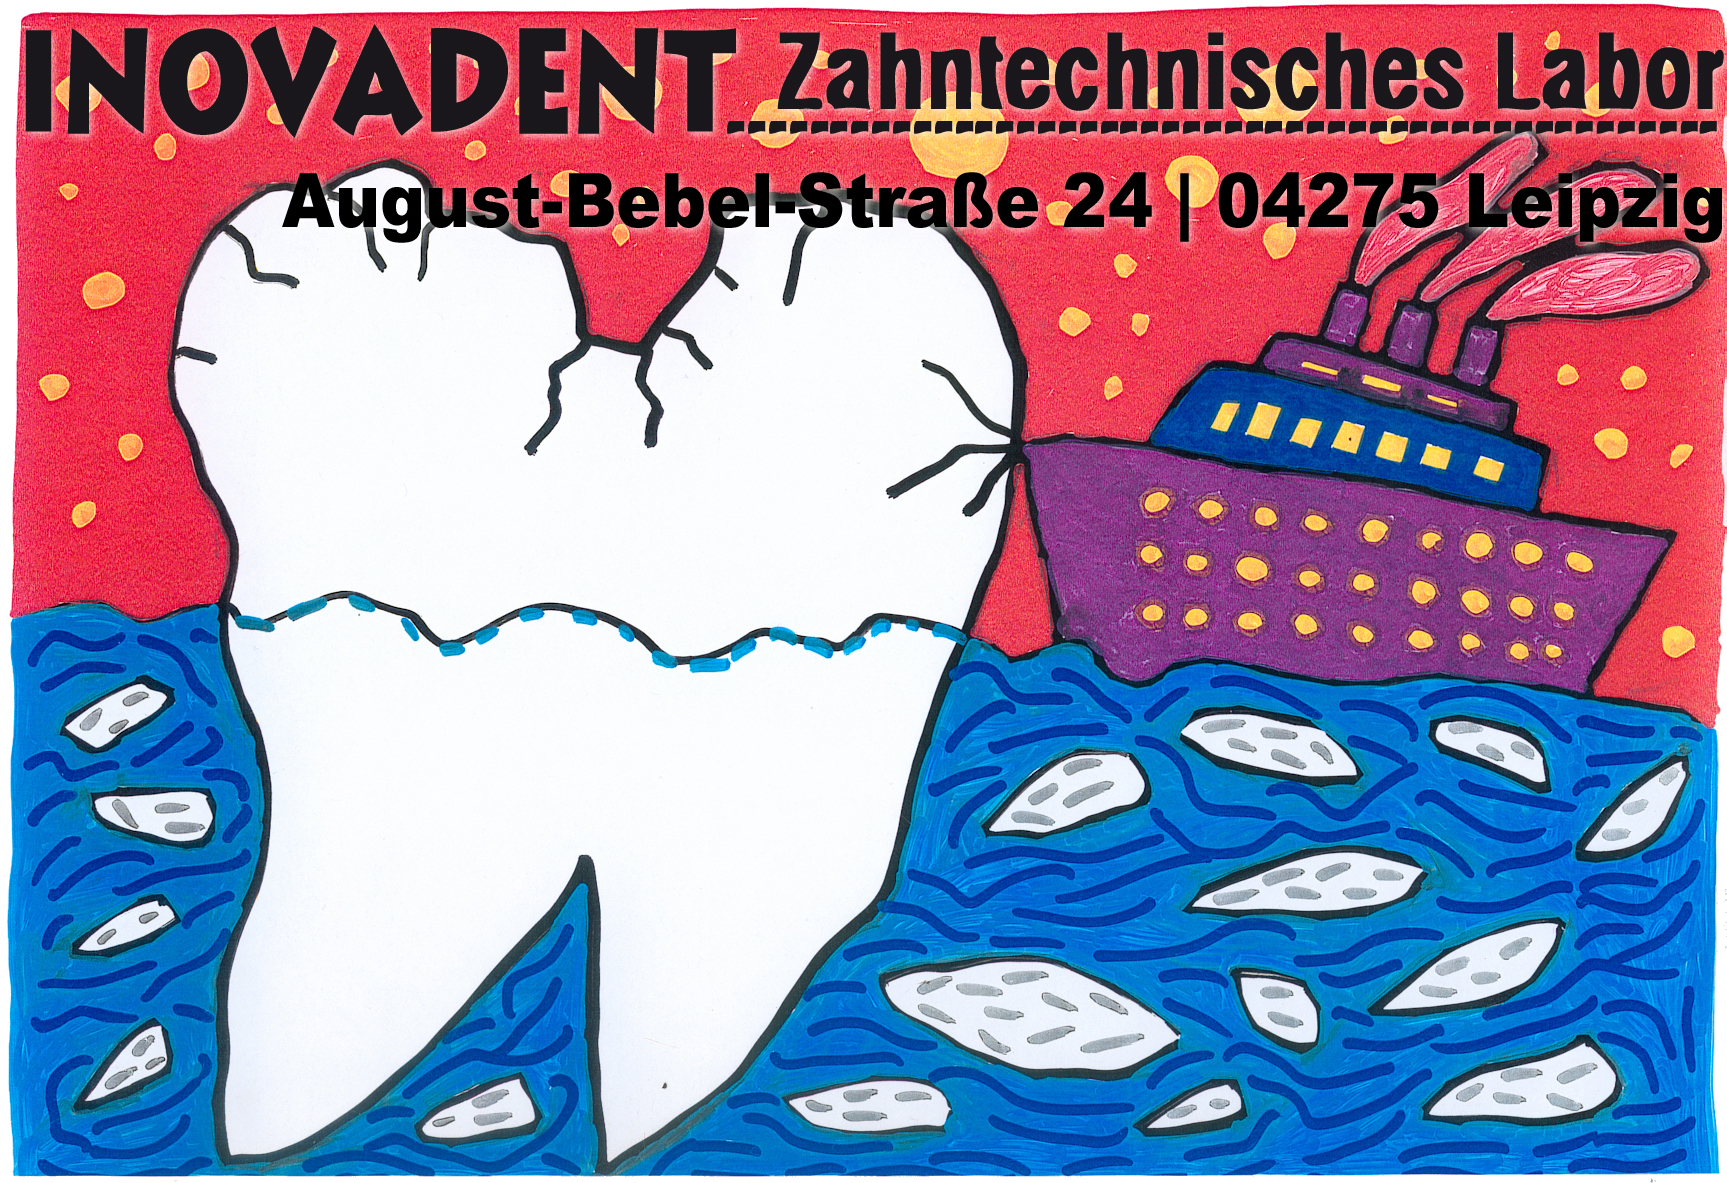 Inovadent_Zahn_Logo